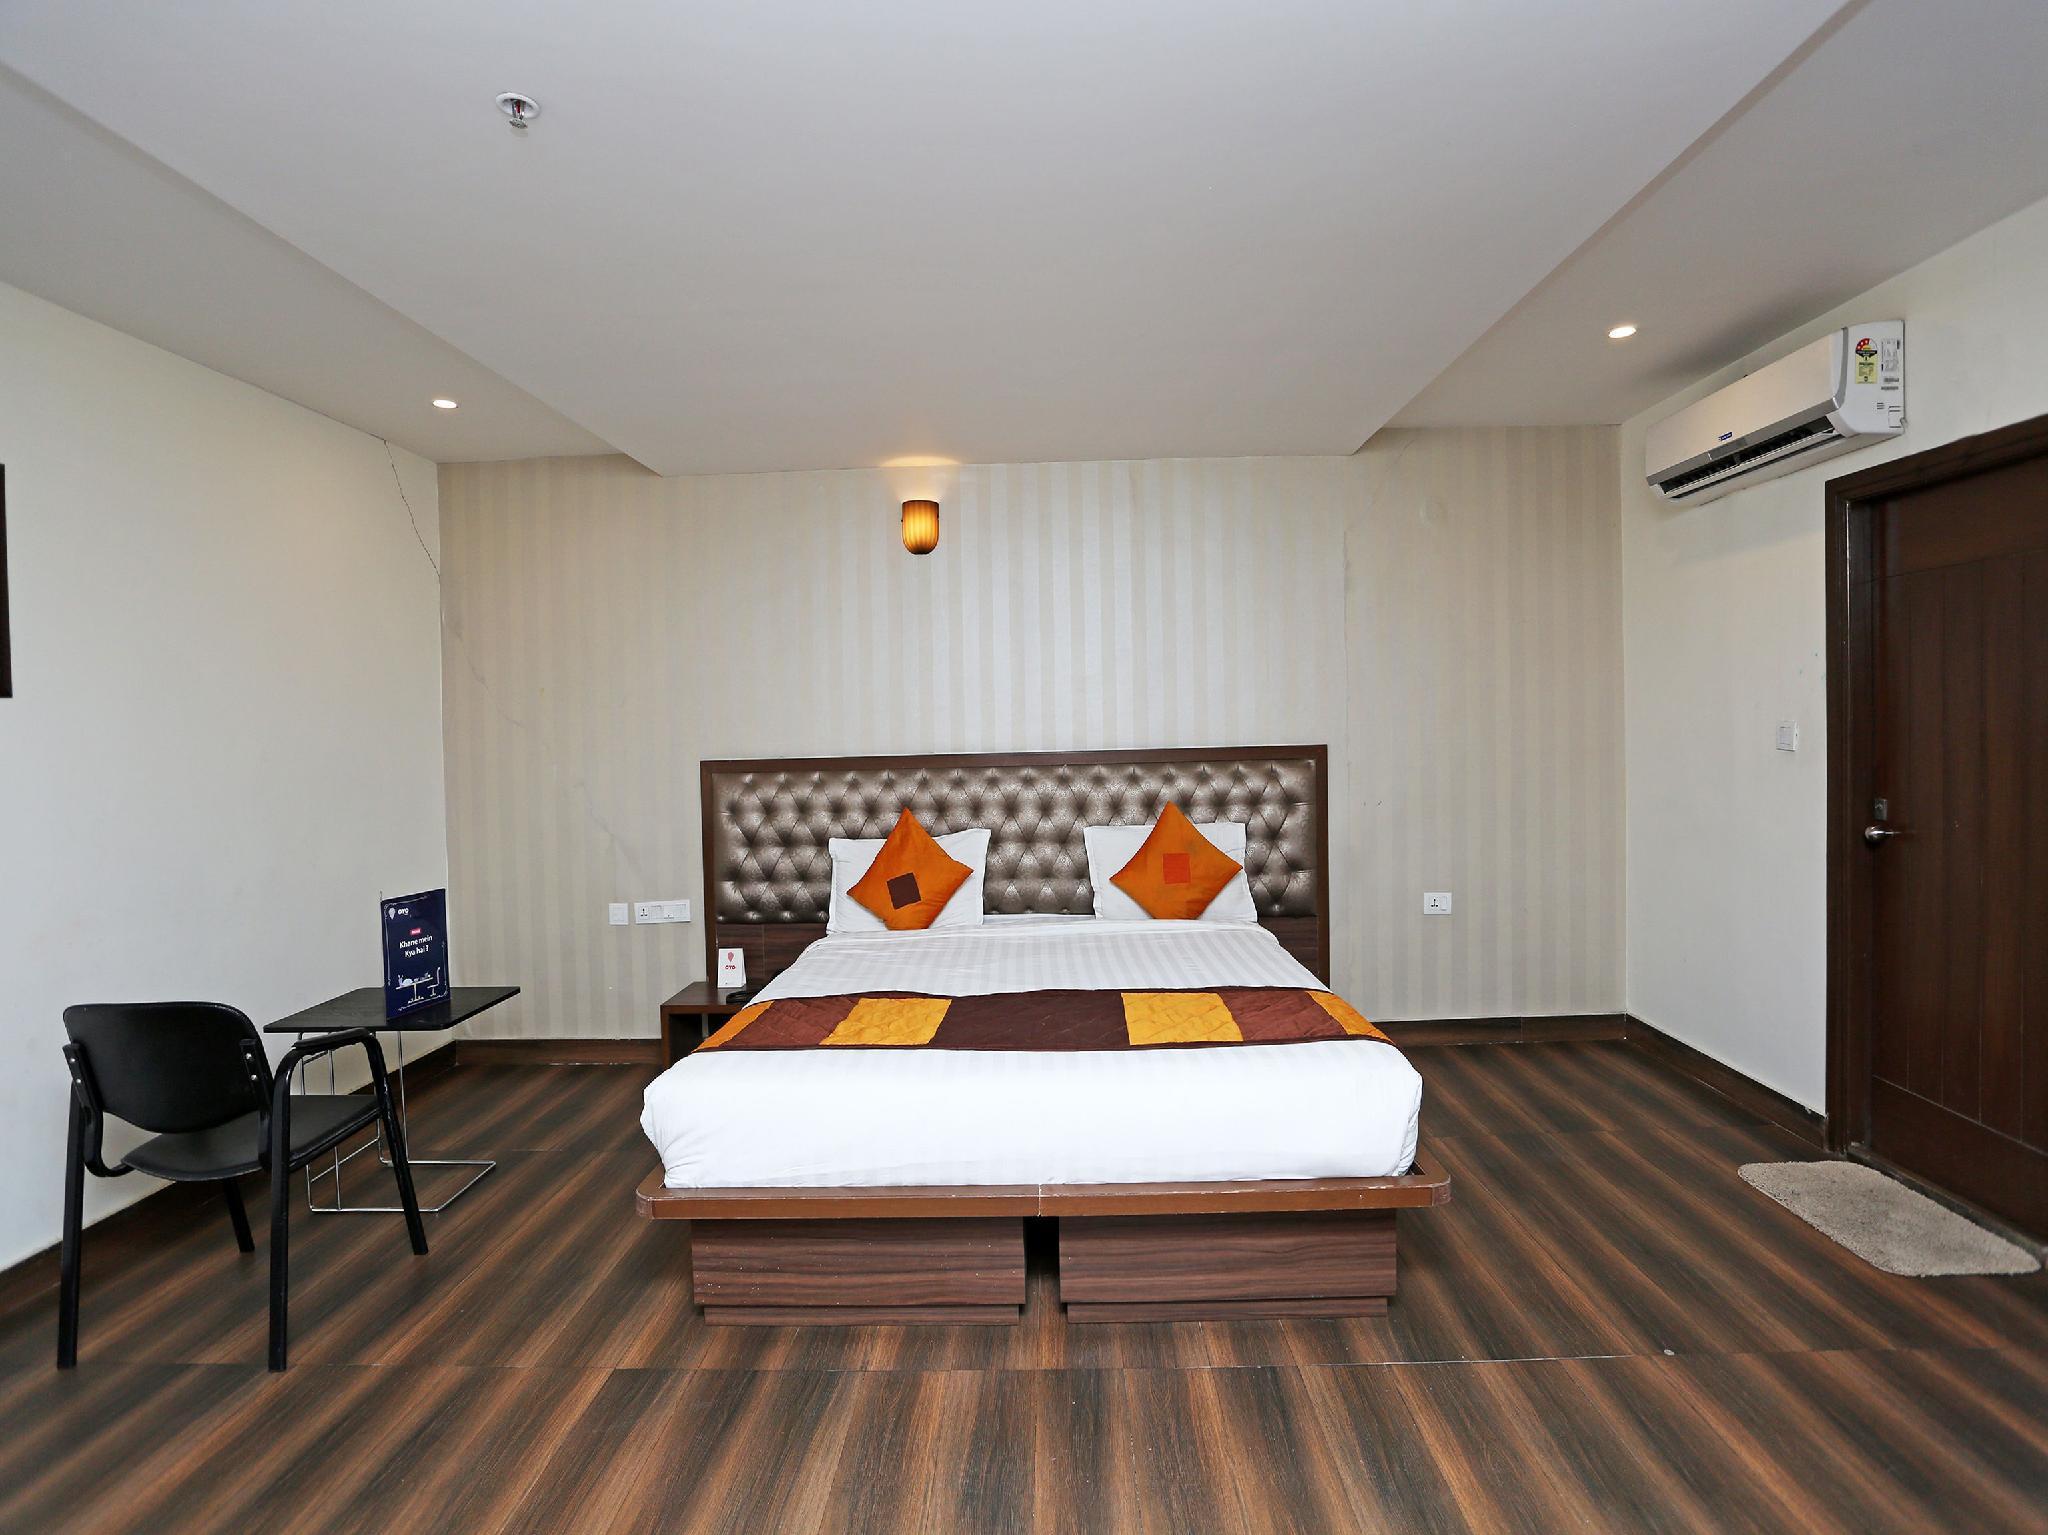 OYO 897 Hotel Surabhi Elite, Ranga Reddy